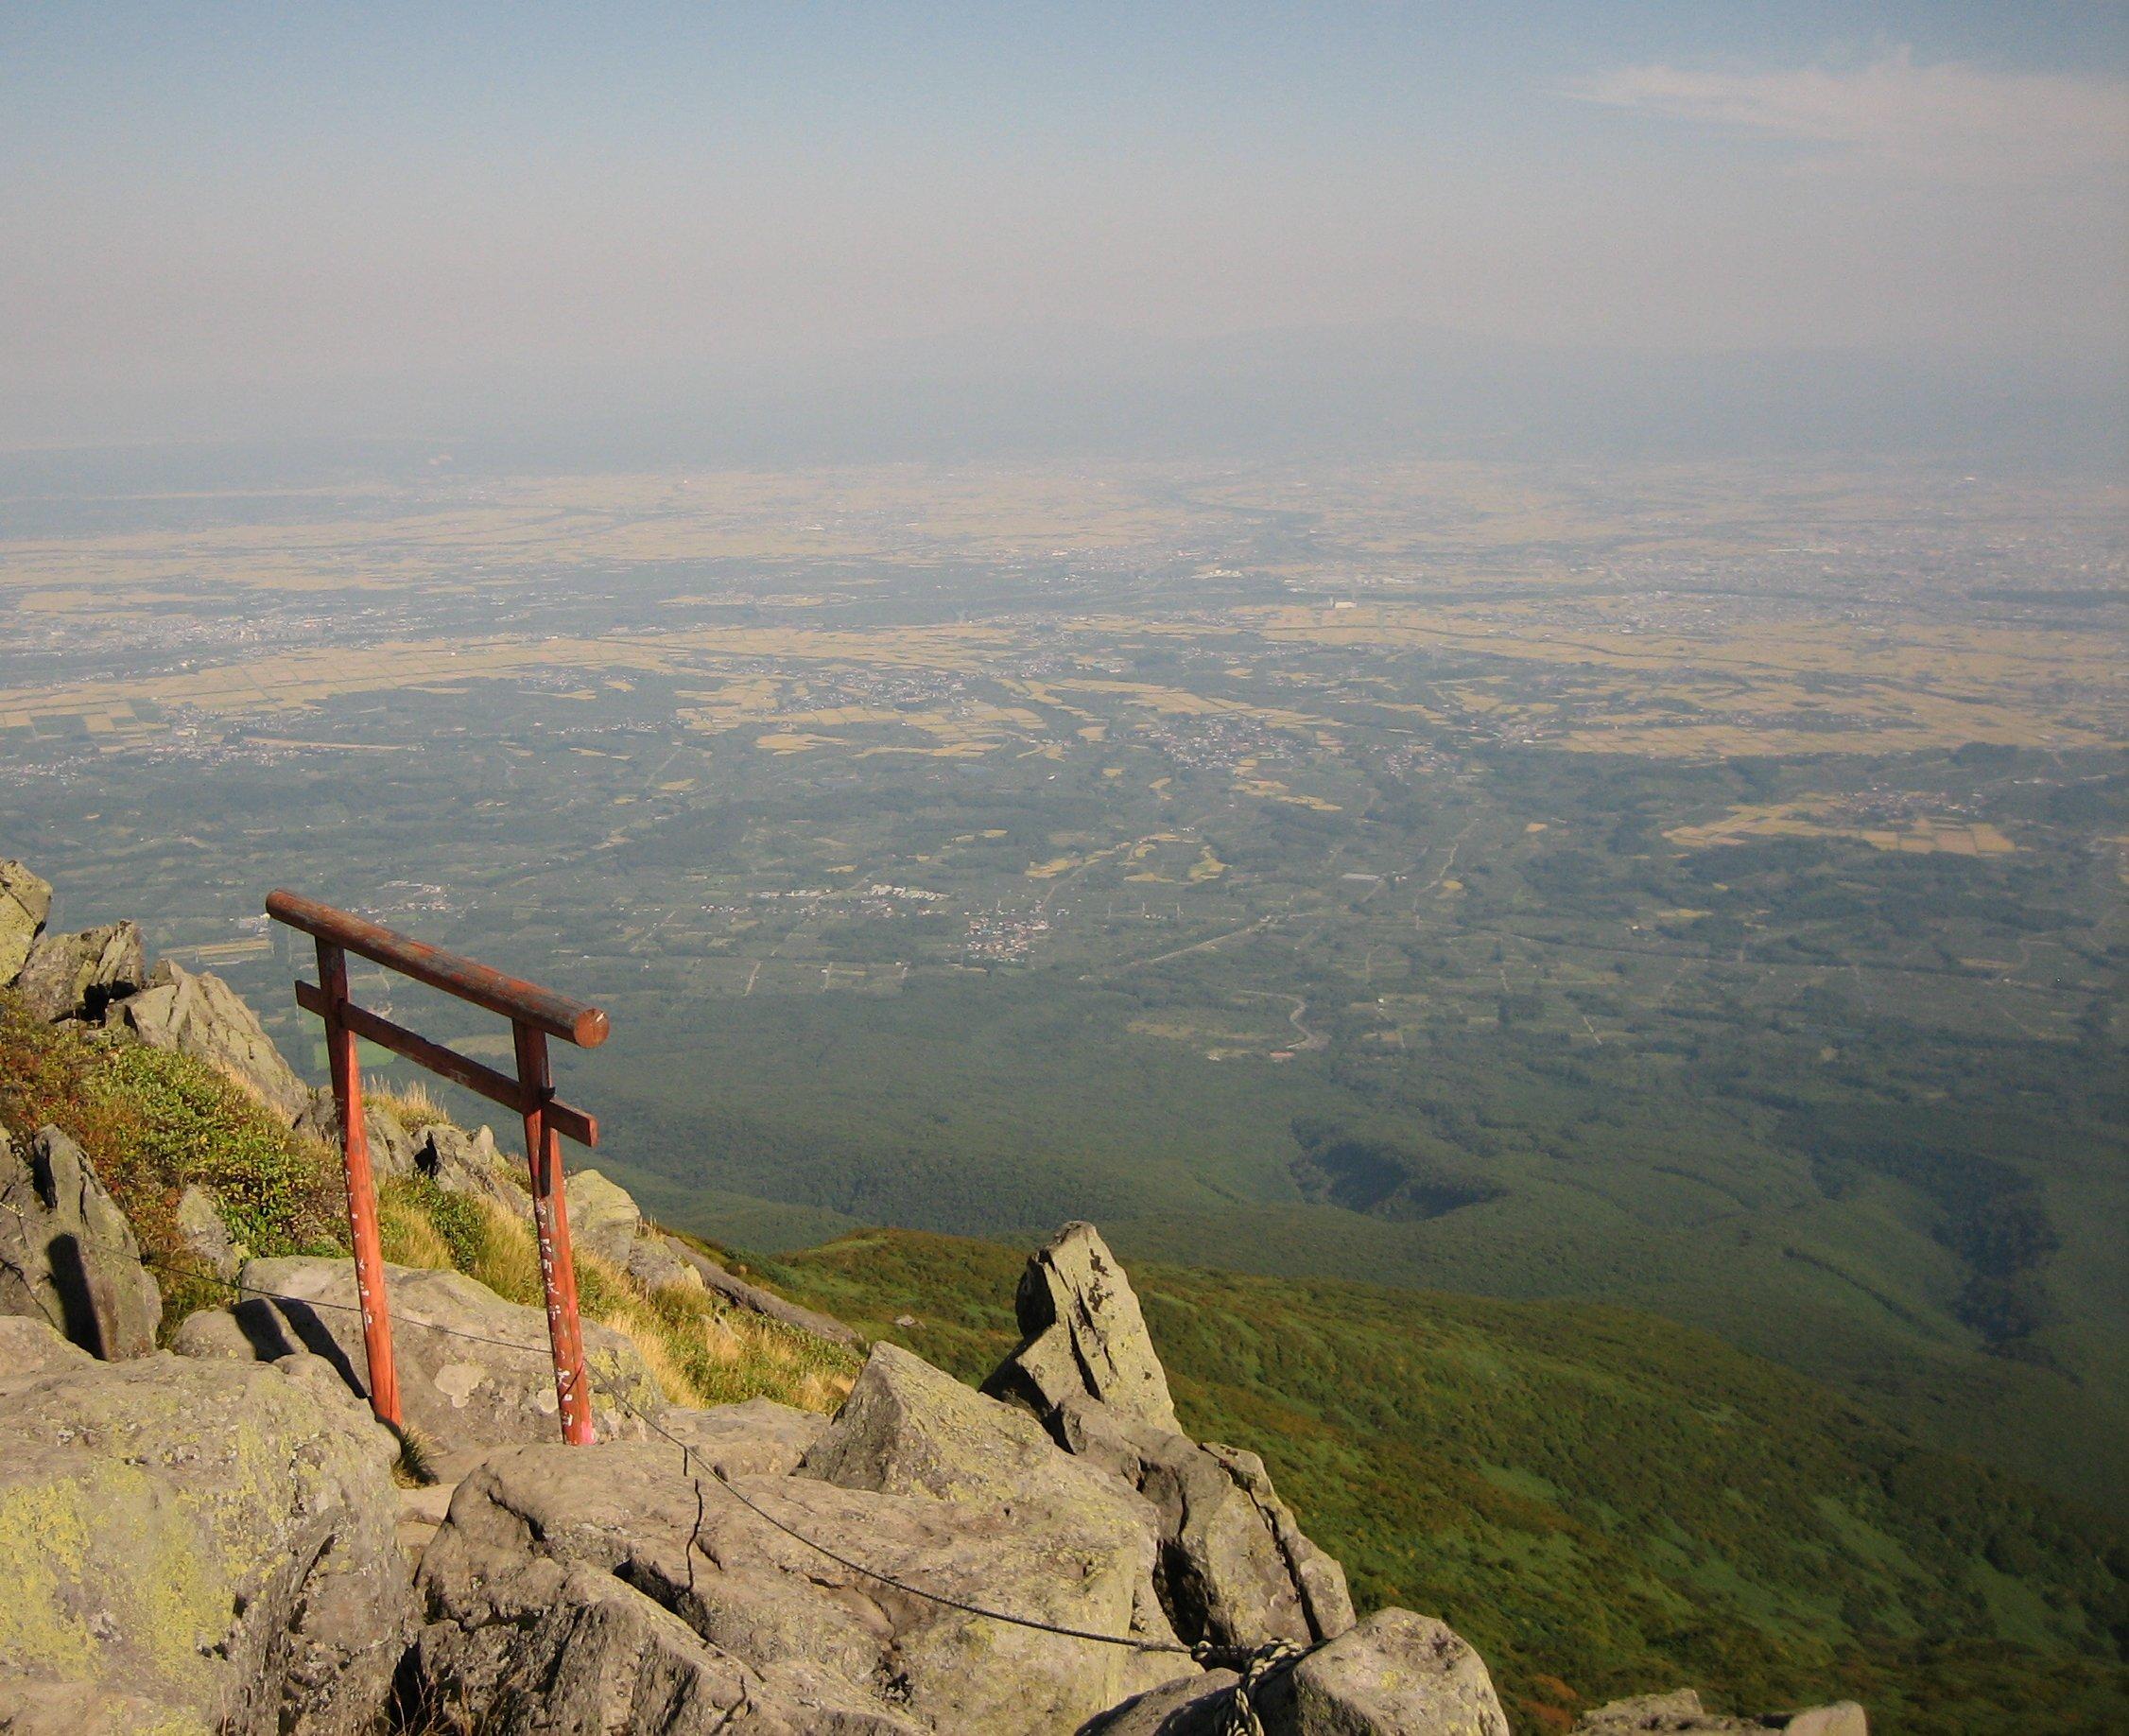 View_from_Mt_Iwaki_in_Aomori_Japan.jpg